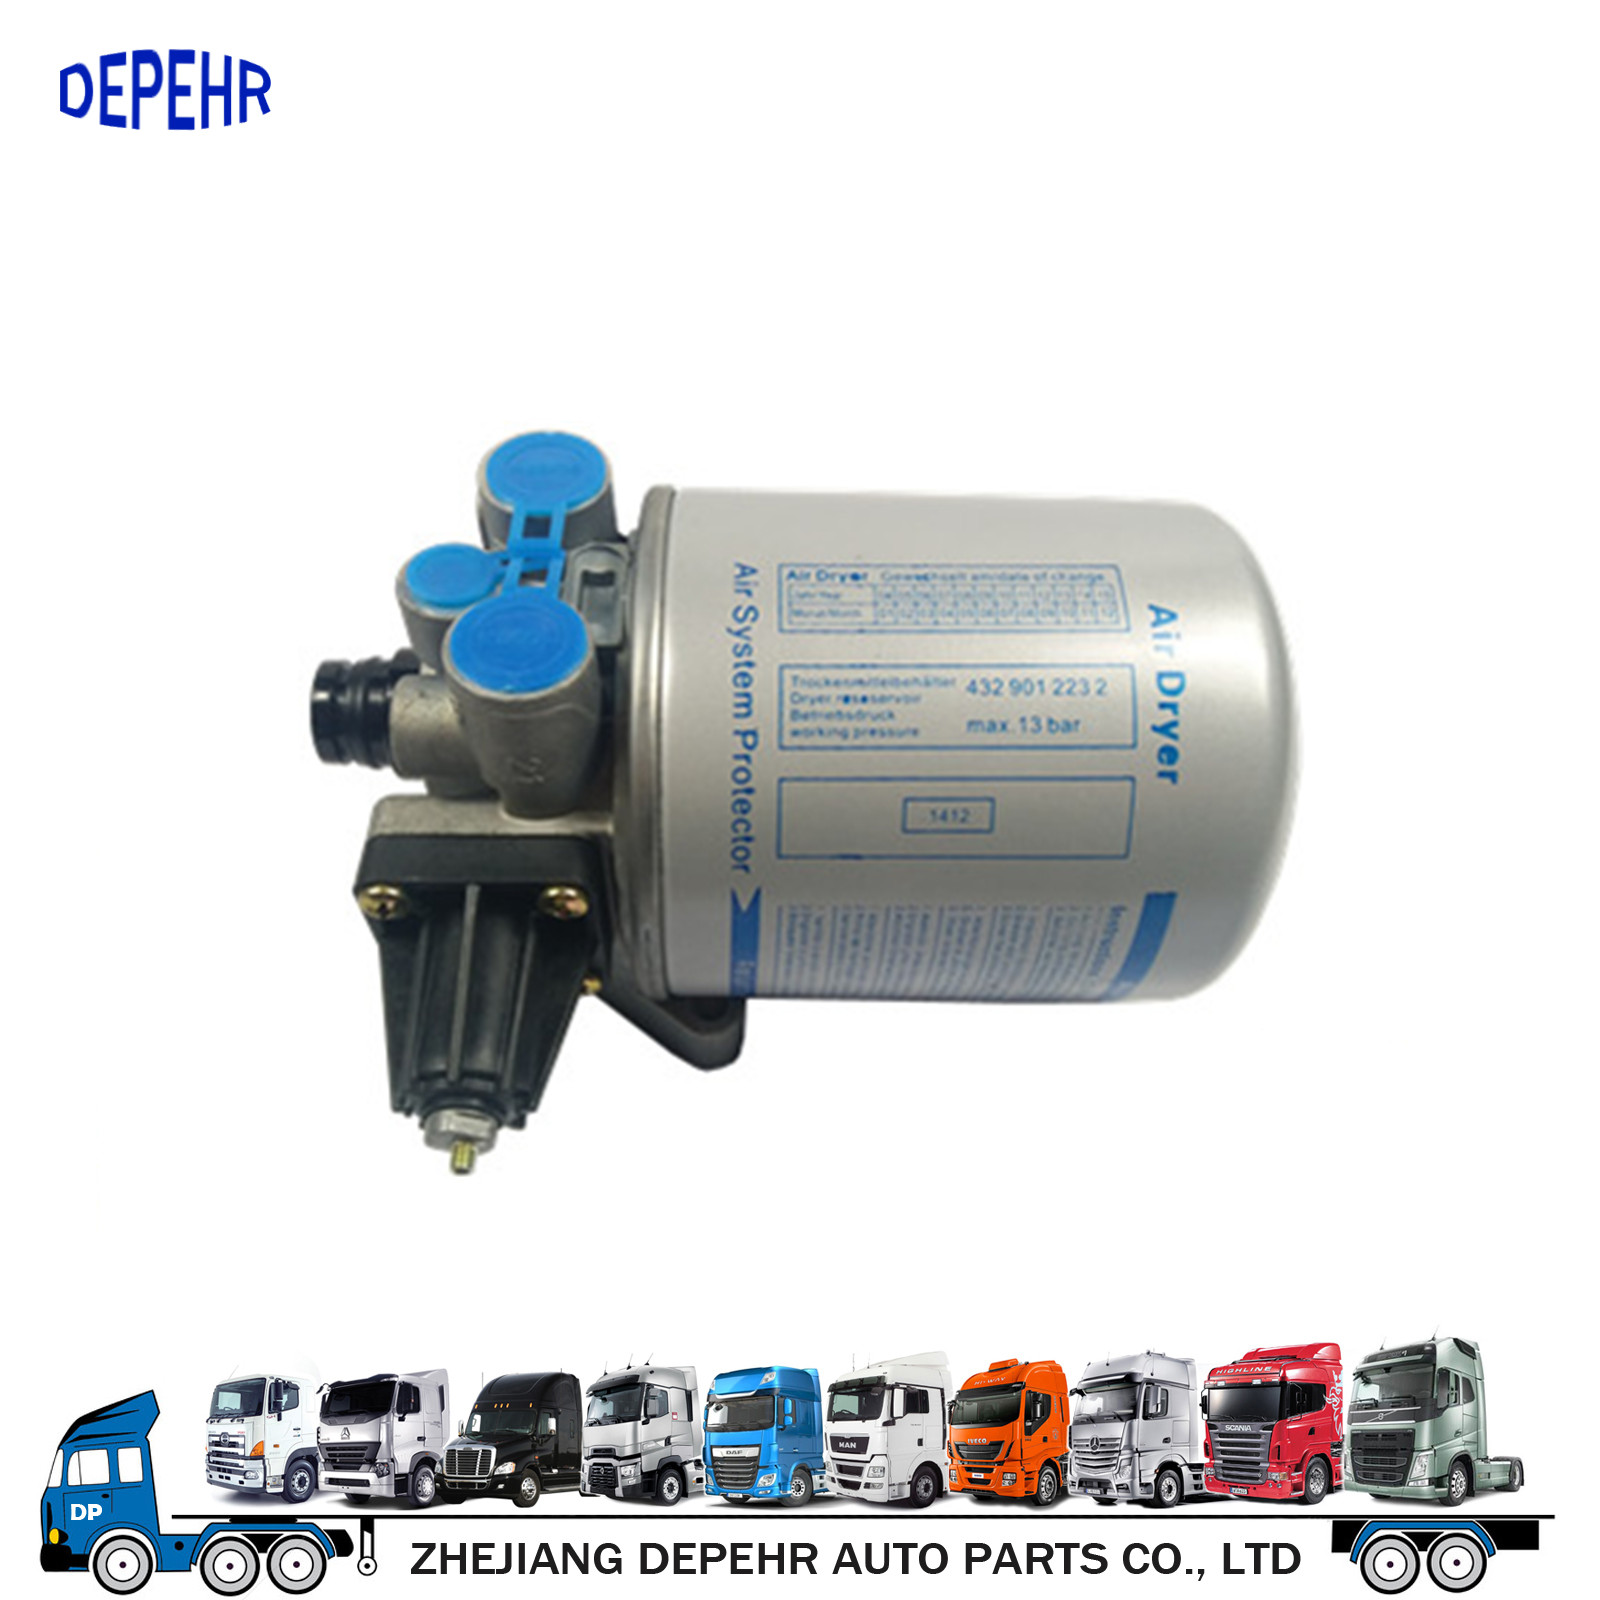 Heavy Duty European Truck Brake Part VOLVO FH/FM Truck Compressed Air Dryer Assy 20410156 4324101910